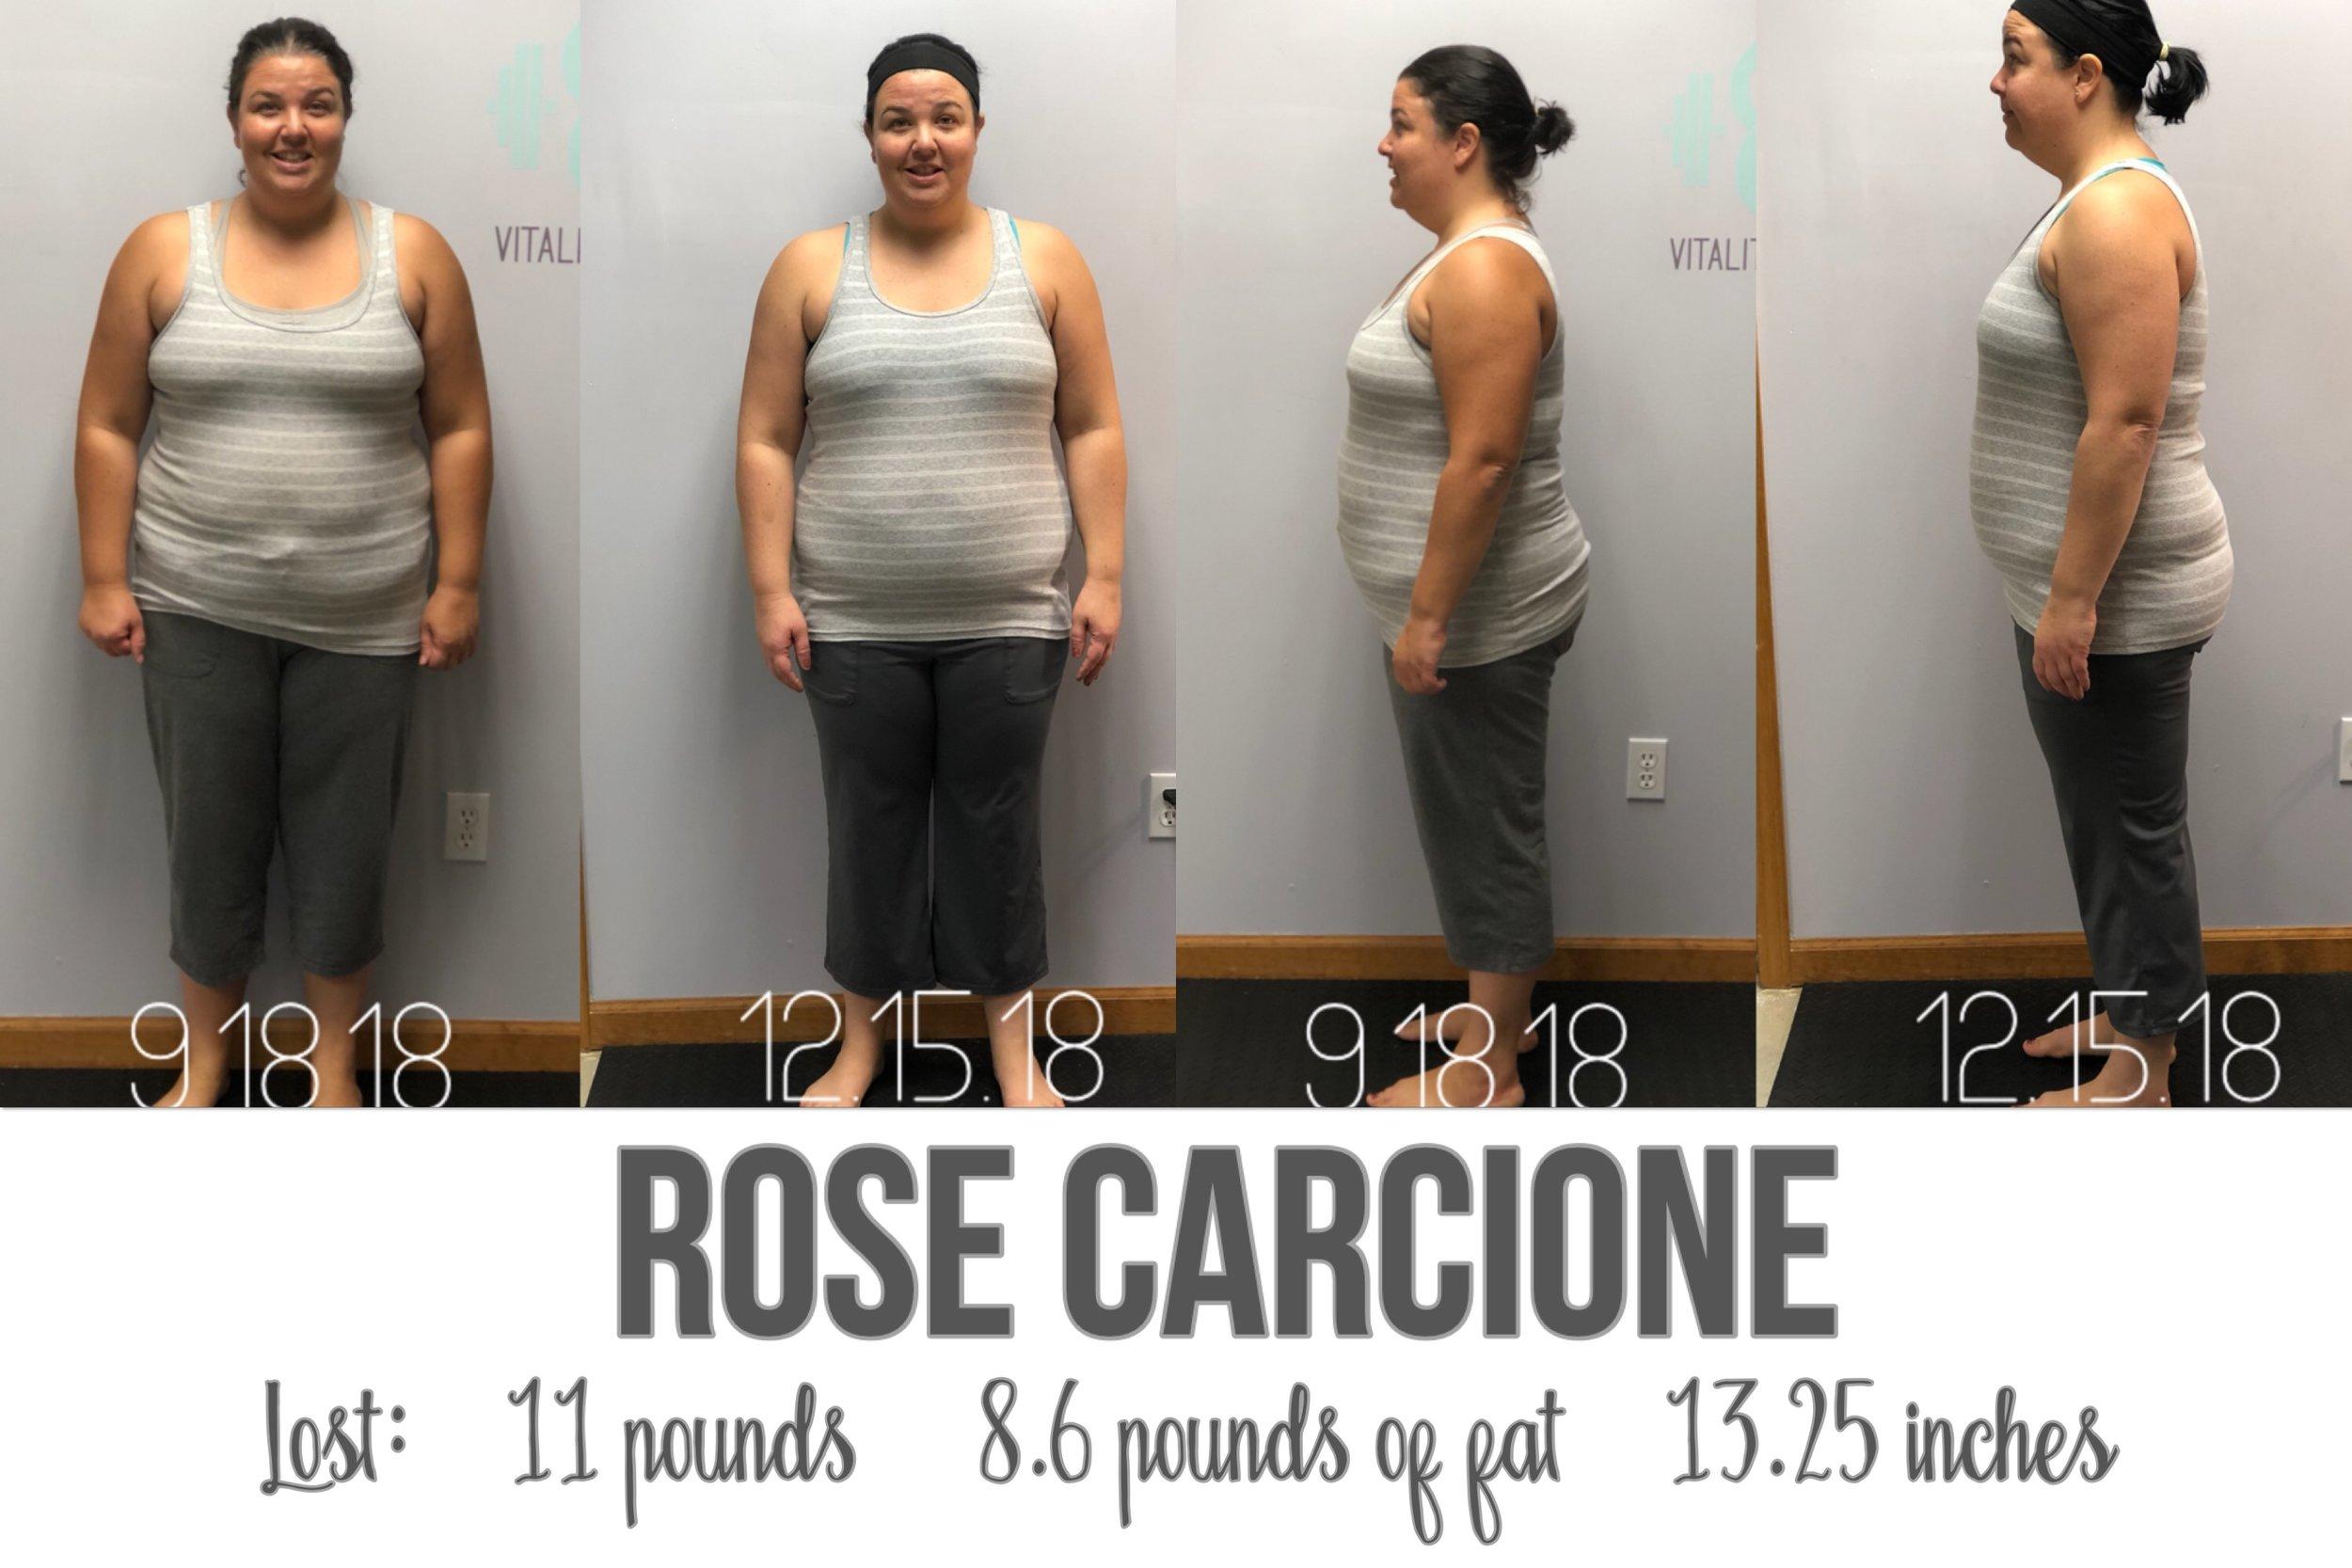 Rose Carcione.jpg